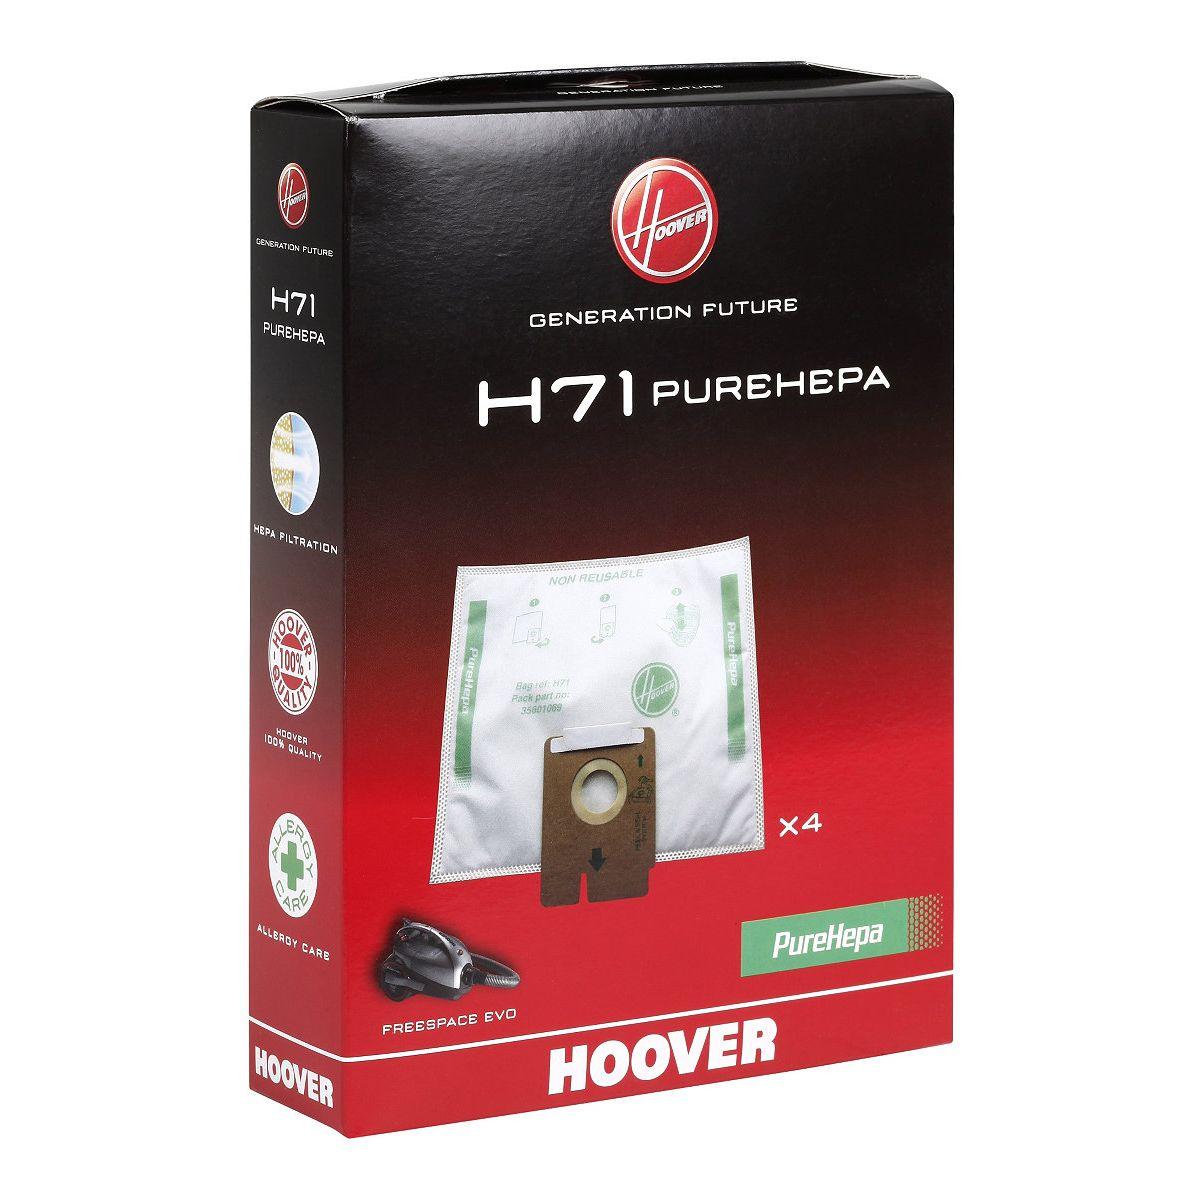 Sac aspirateur HOOVER H71 Sac microfibre EPA x4